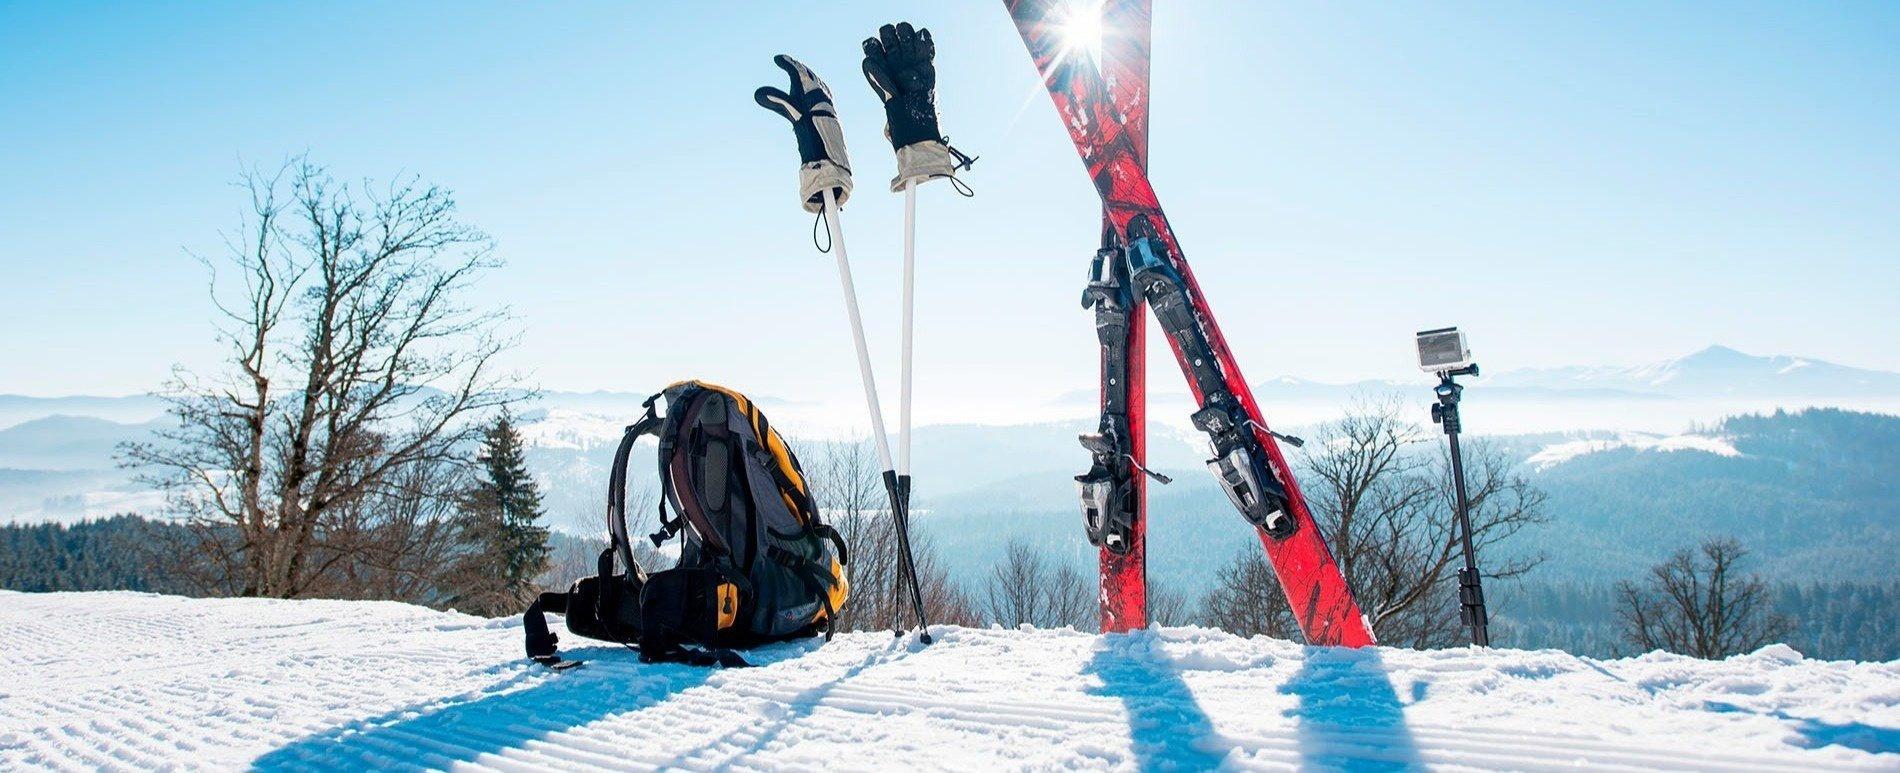 Grandvalira hotel e oferta de esqui